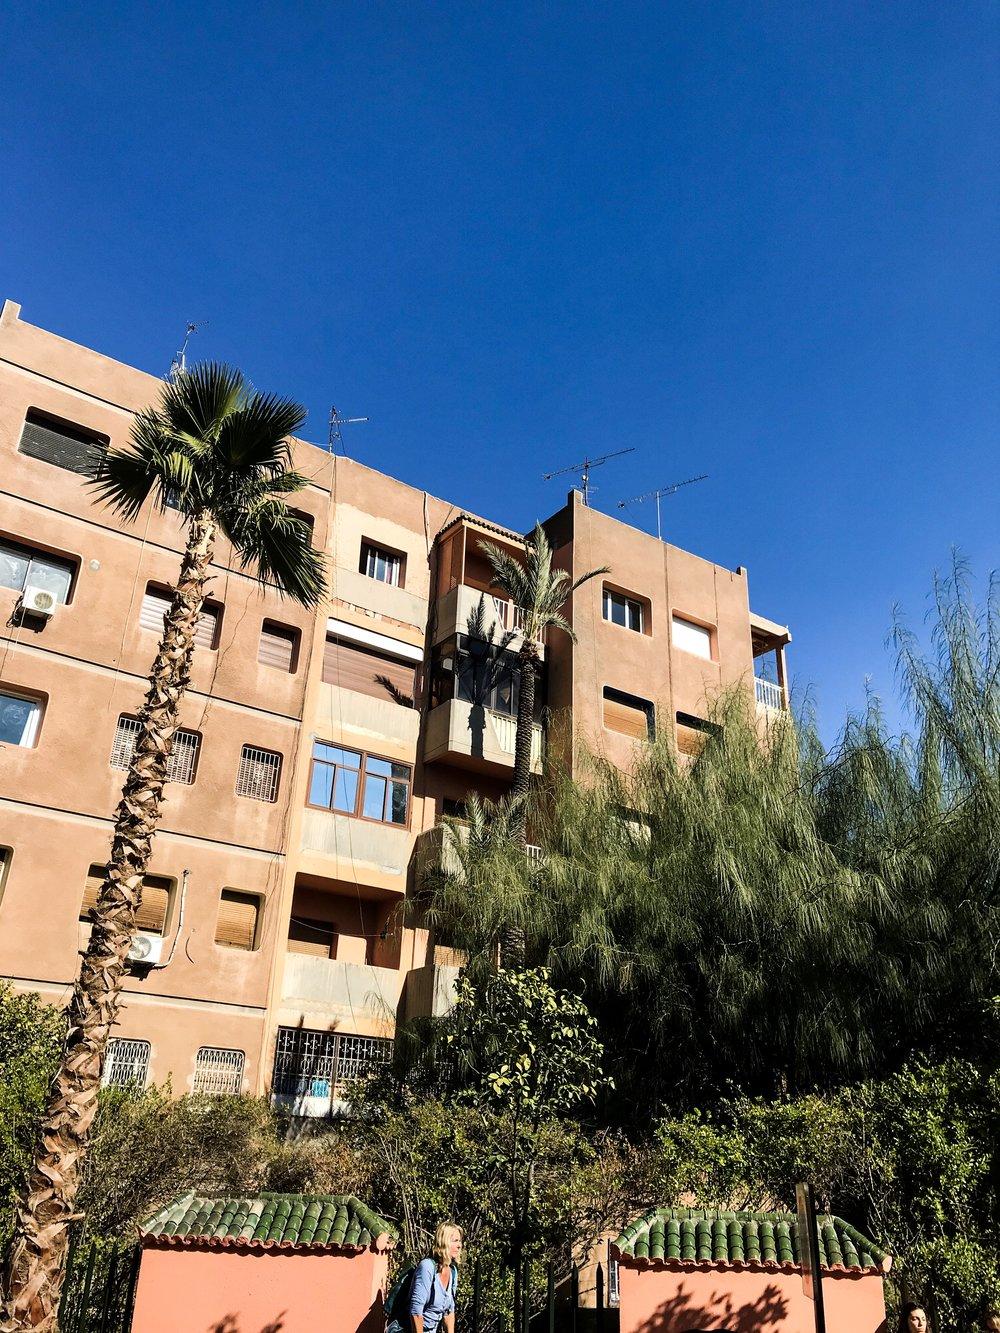 Marrakech :  The Pink City!